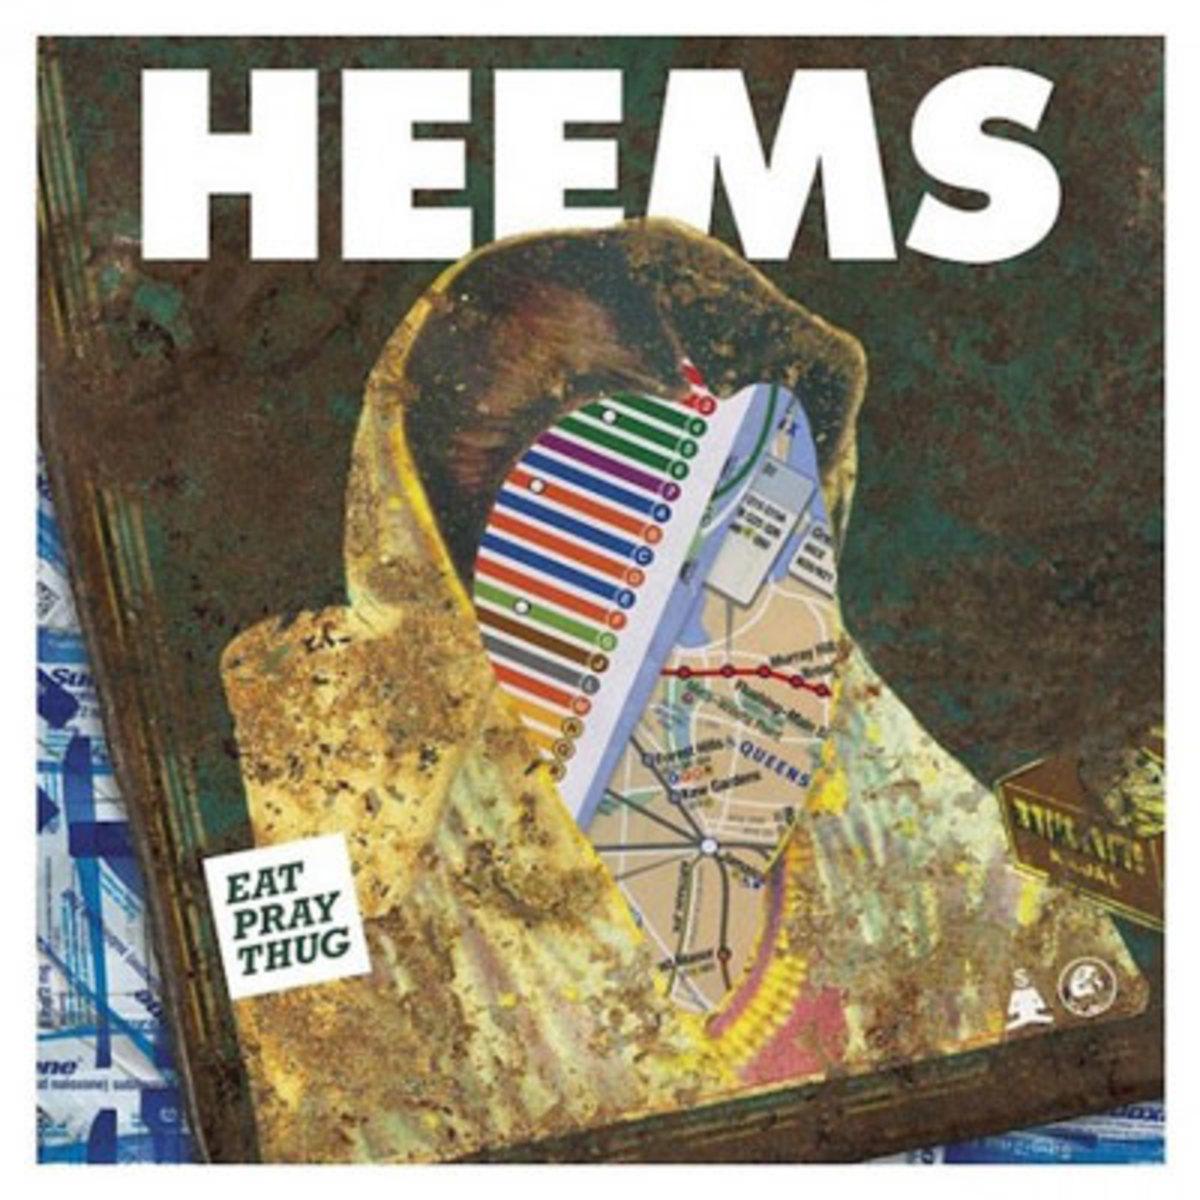 heems-eat-pray-thug.jpg